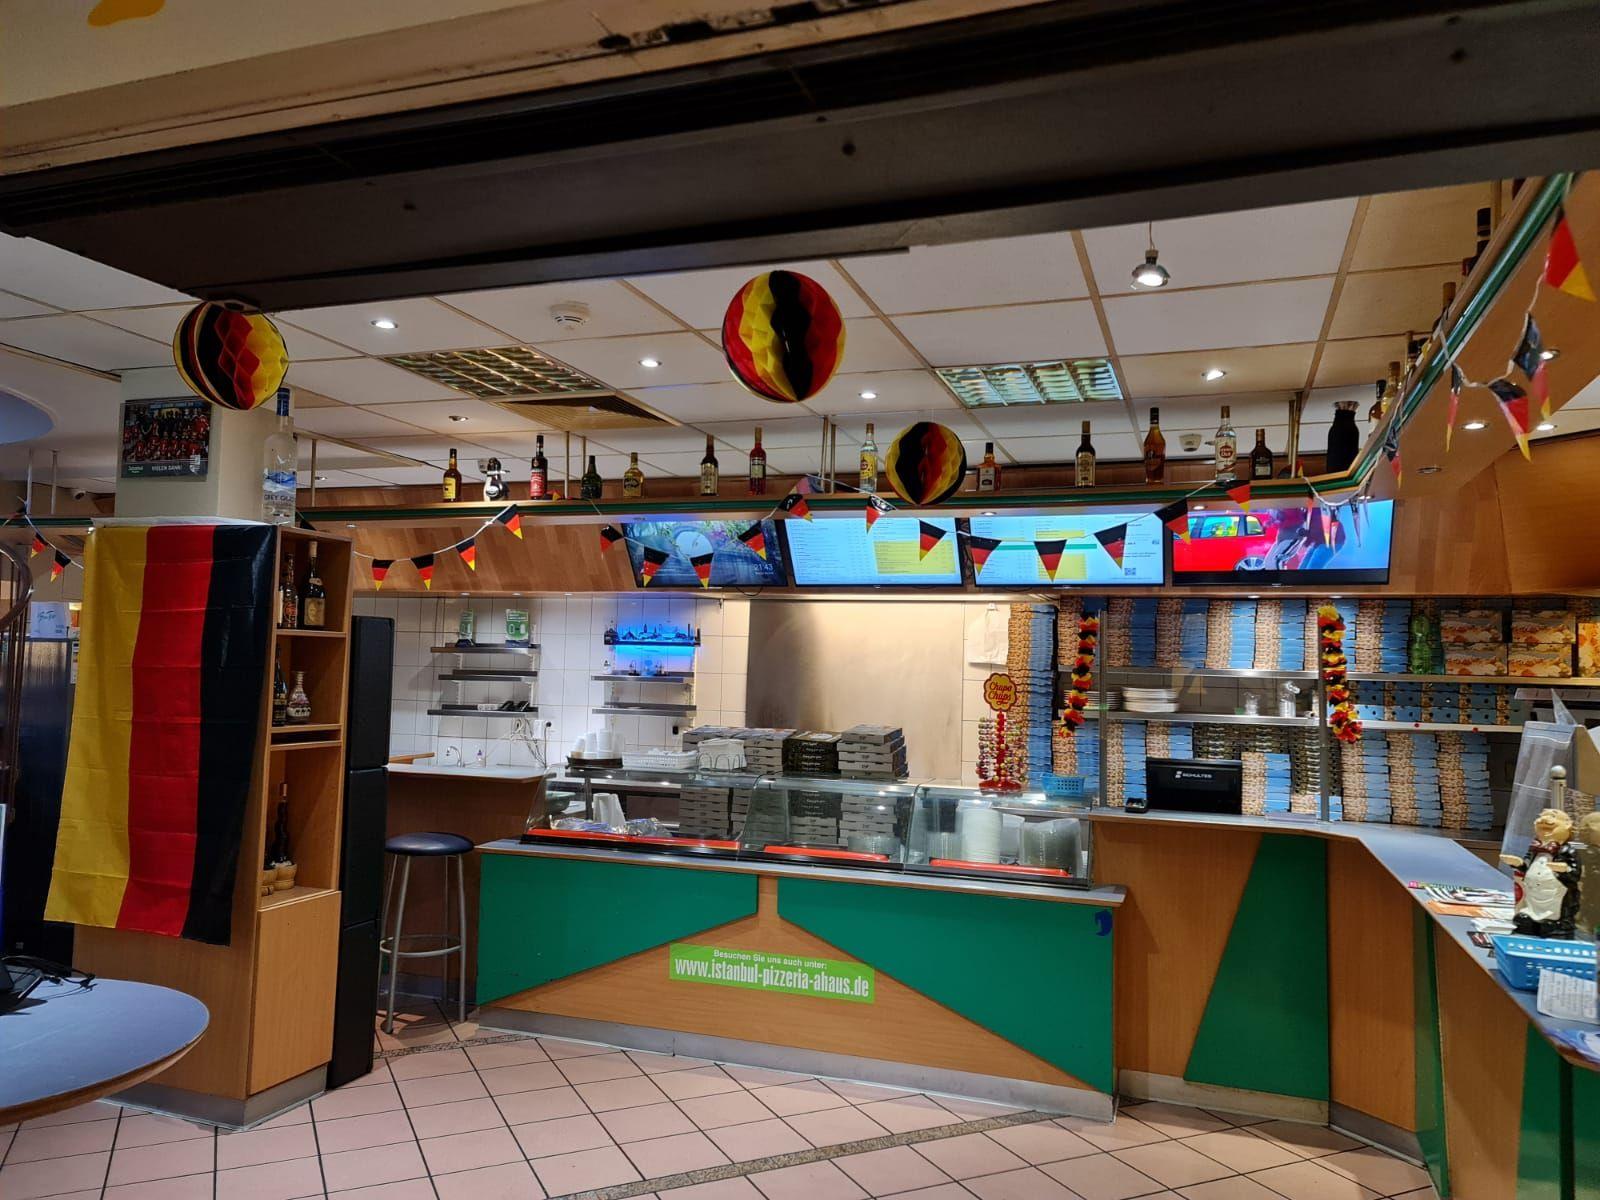 Aktuelle Neuigkeiten | Istanbul Pizzeria Ahaus